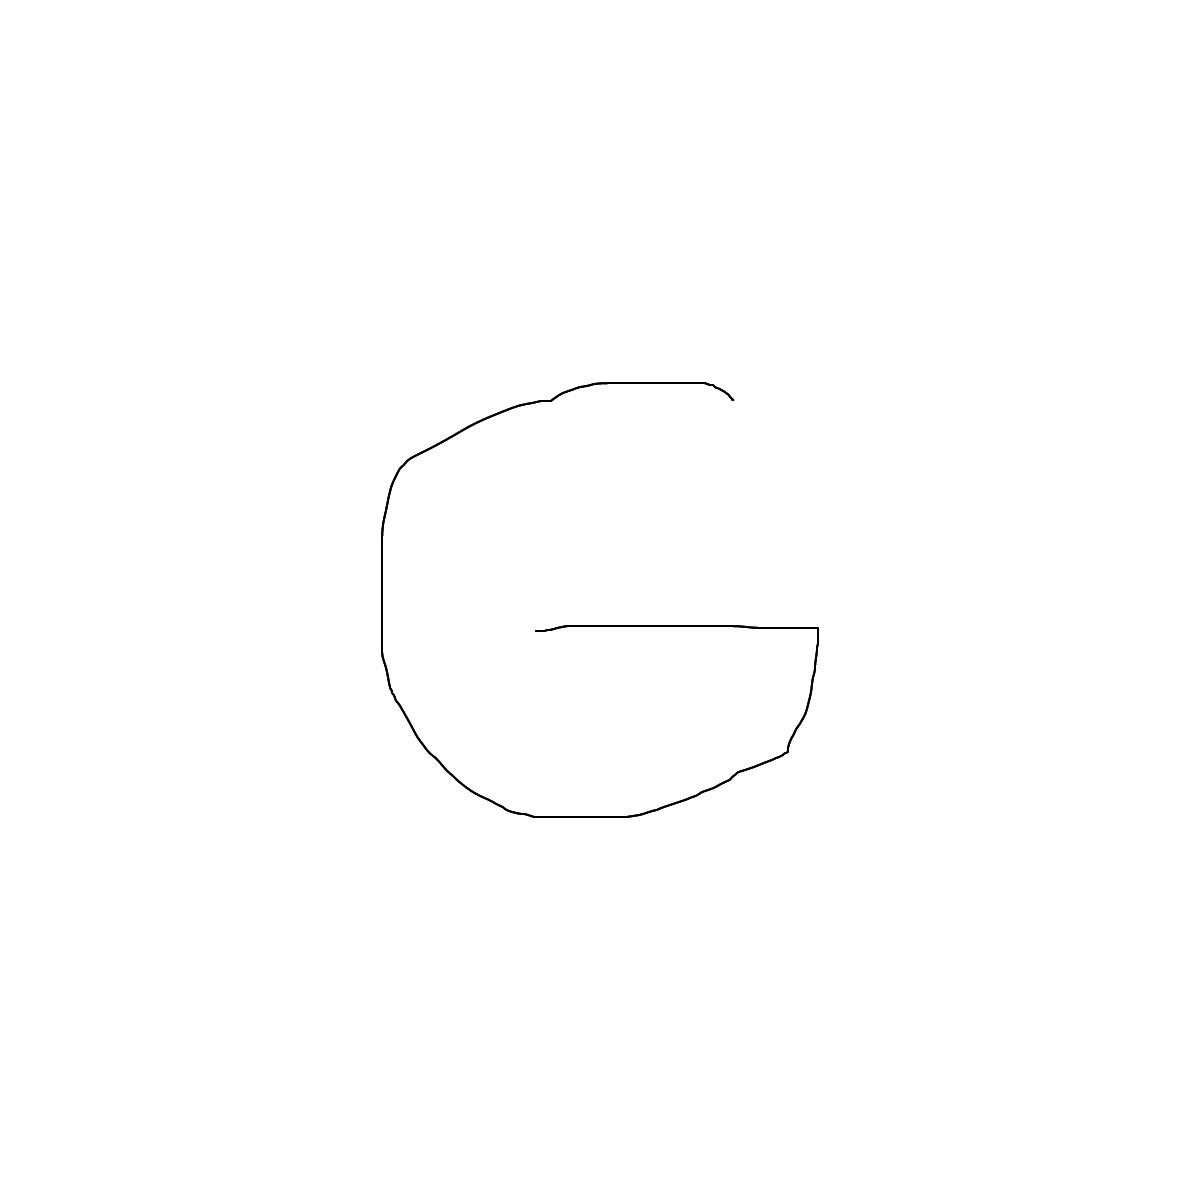 BAAAM drawing#22317 lat:57.8570938110351560lng: 56.1129798889160160